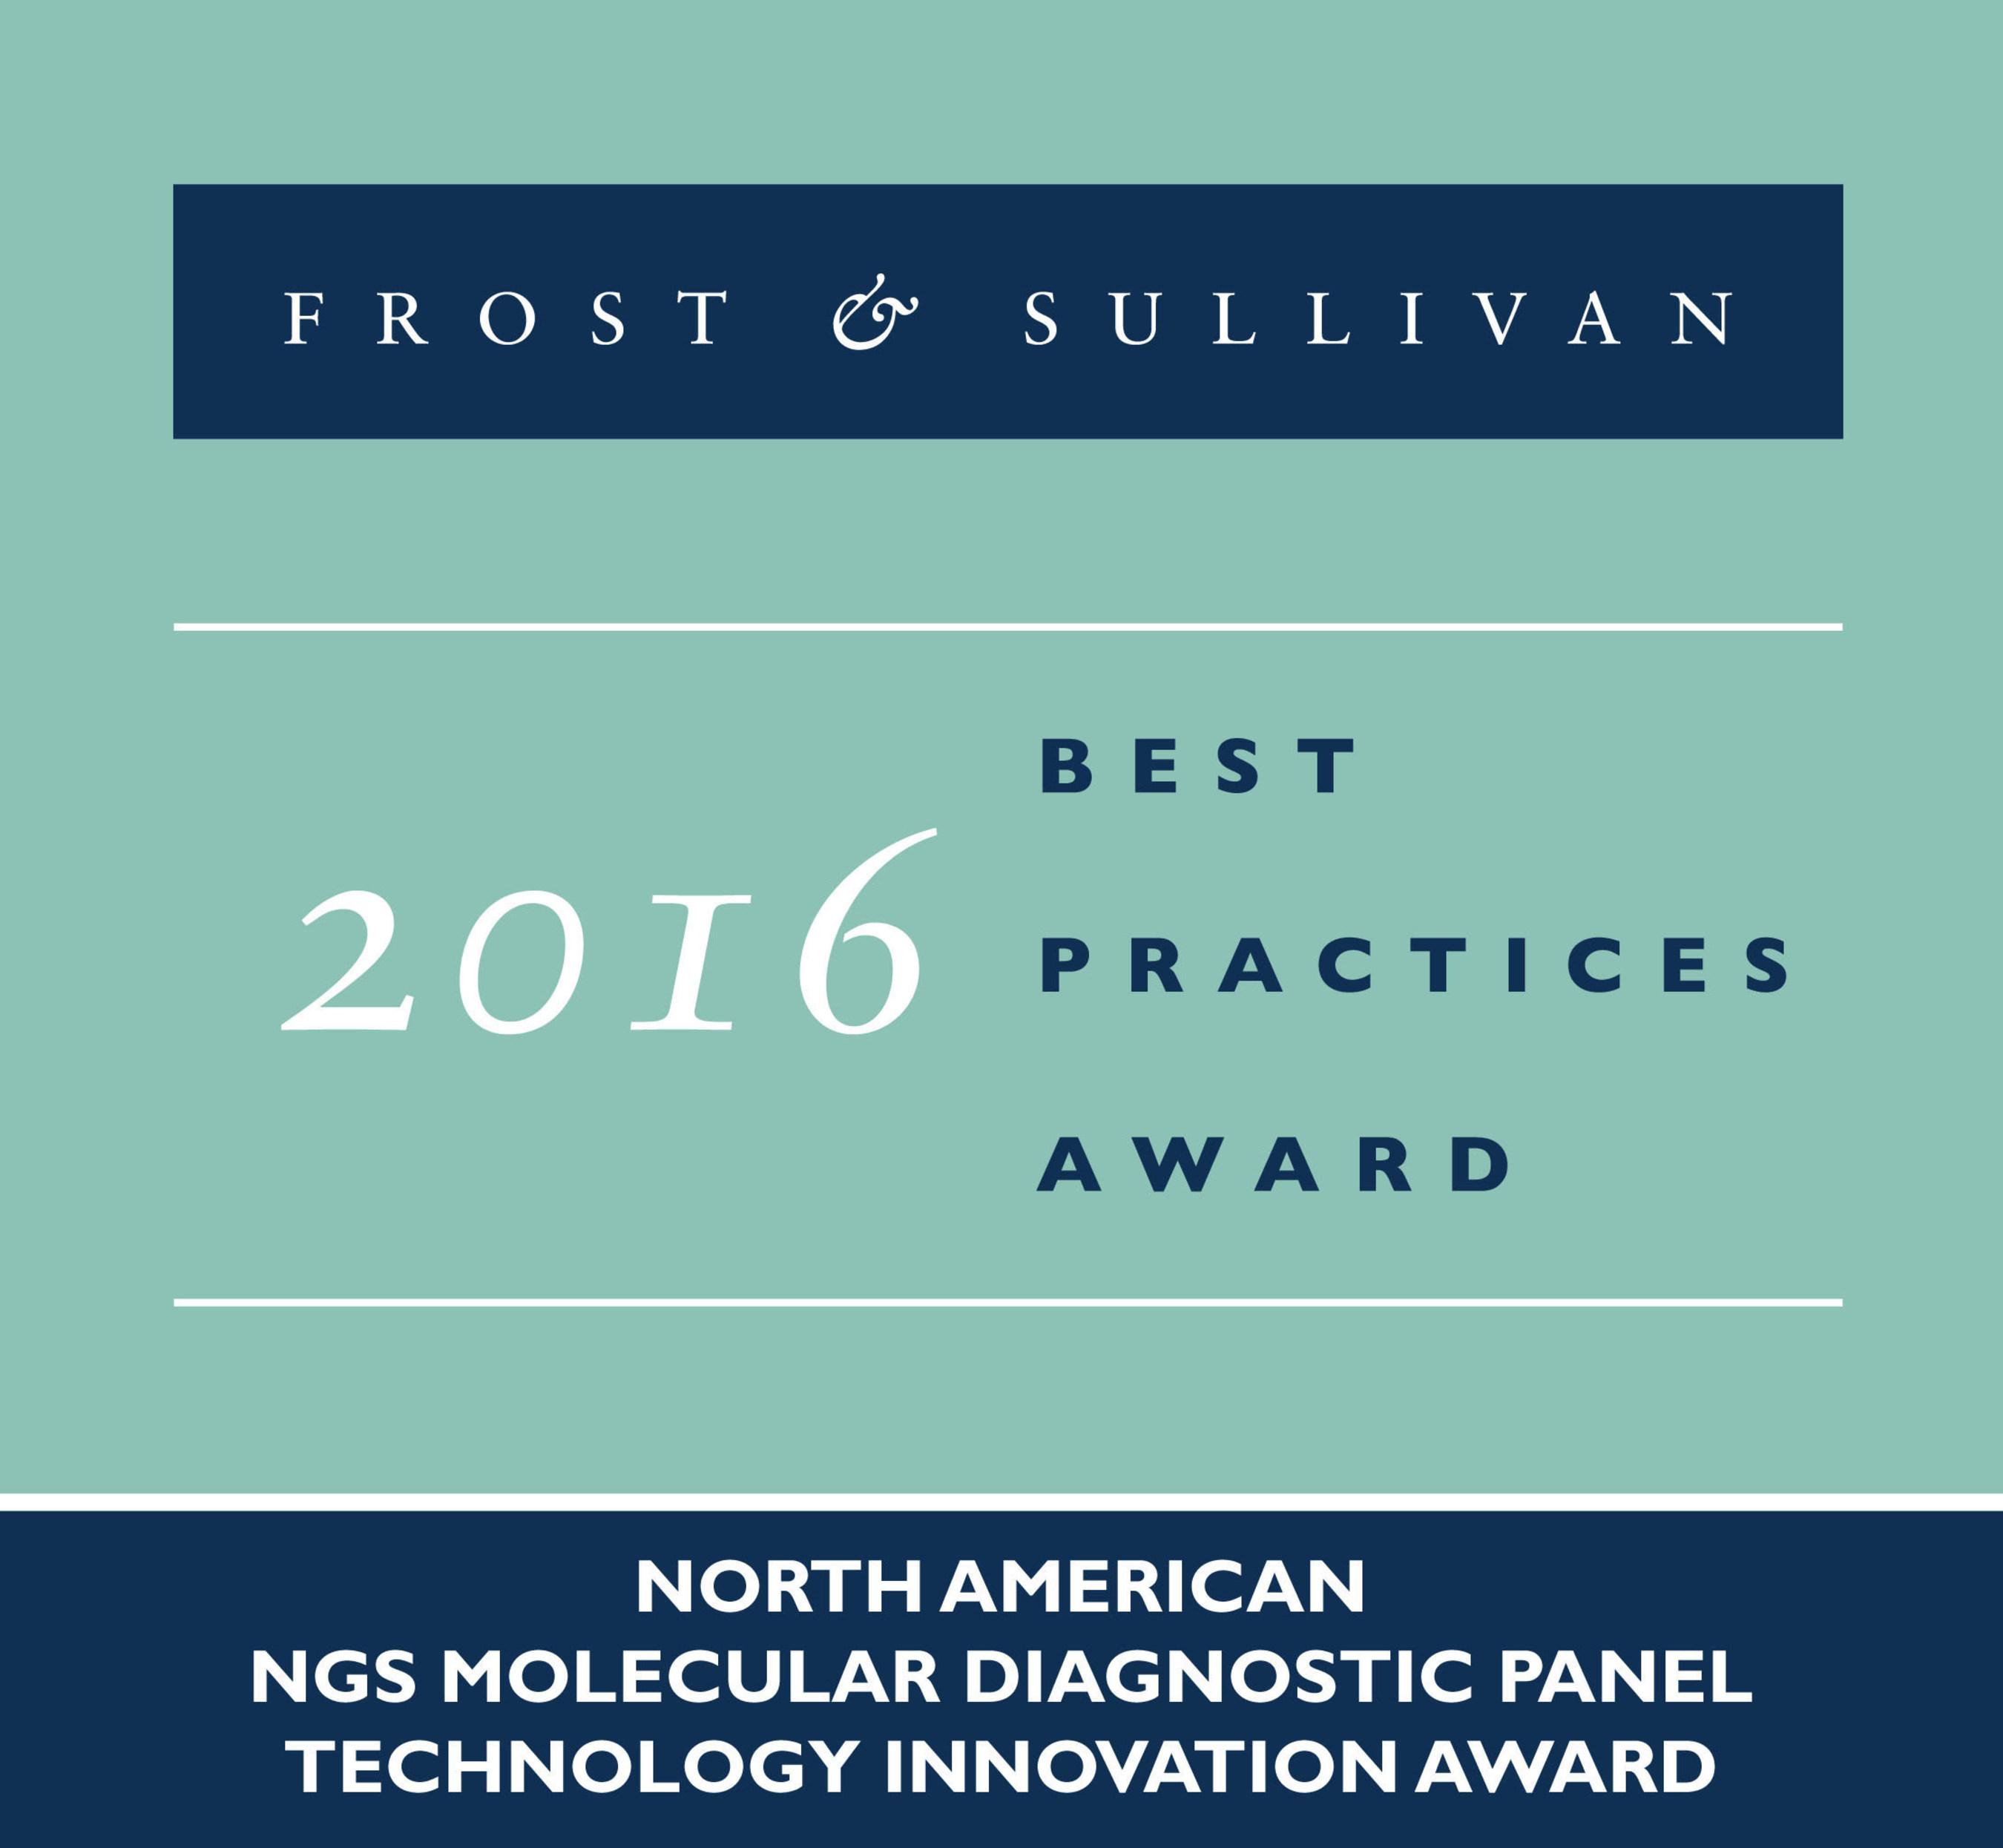 Frost & Sullivan Applauds Admera Health for Transforming Precision Medicine with an Impressive Set